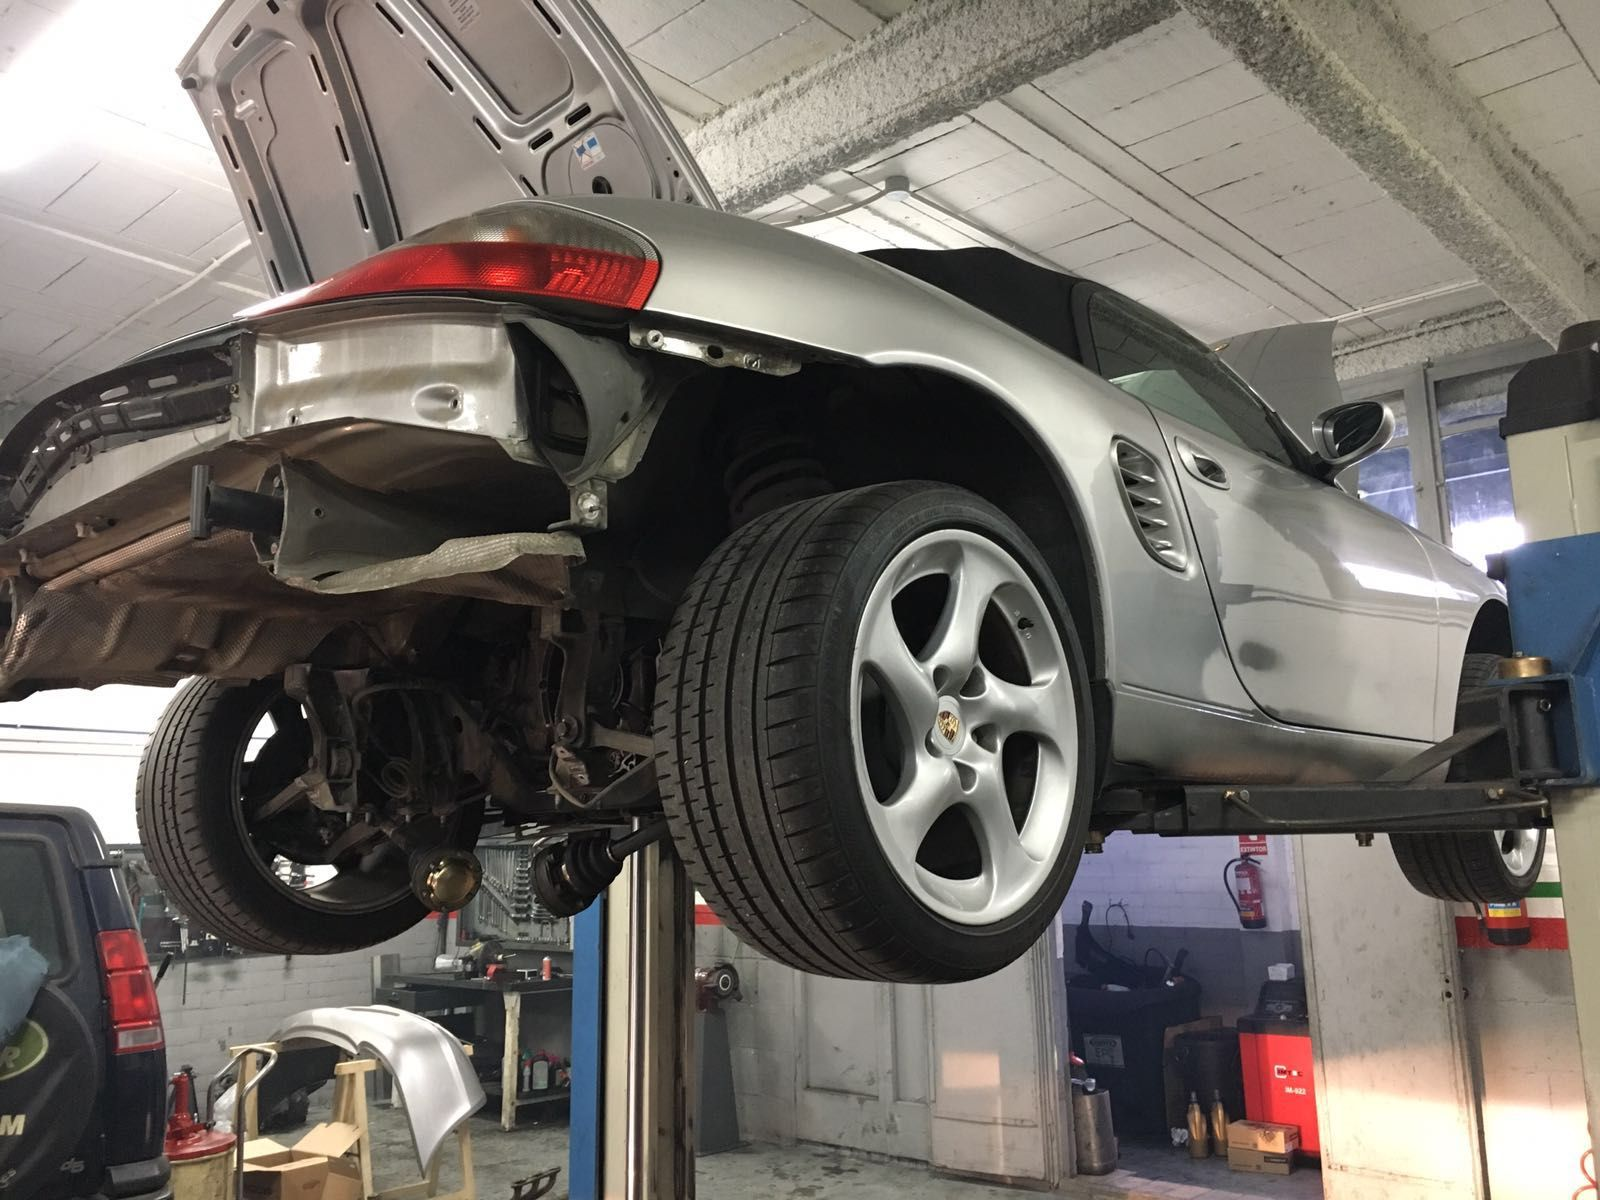 Alineación de dirección: Servicios de Auto Taller JMR 2000